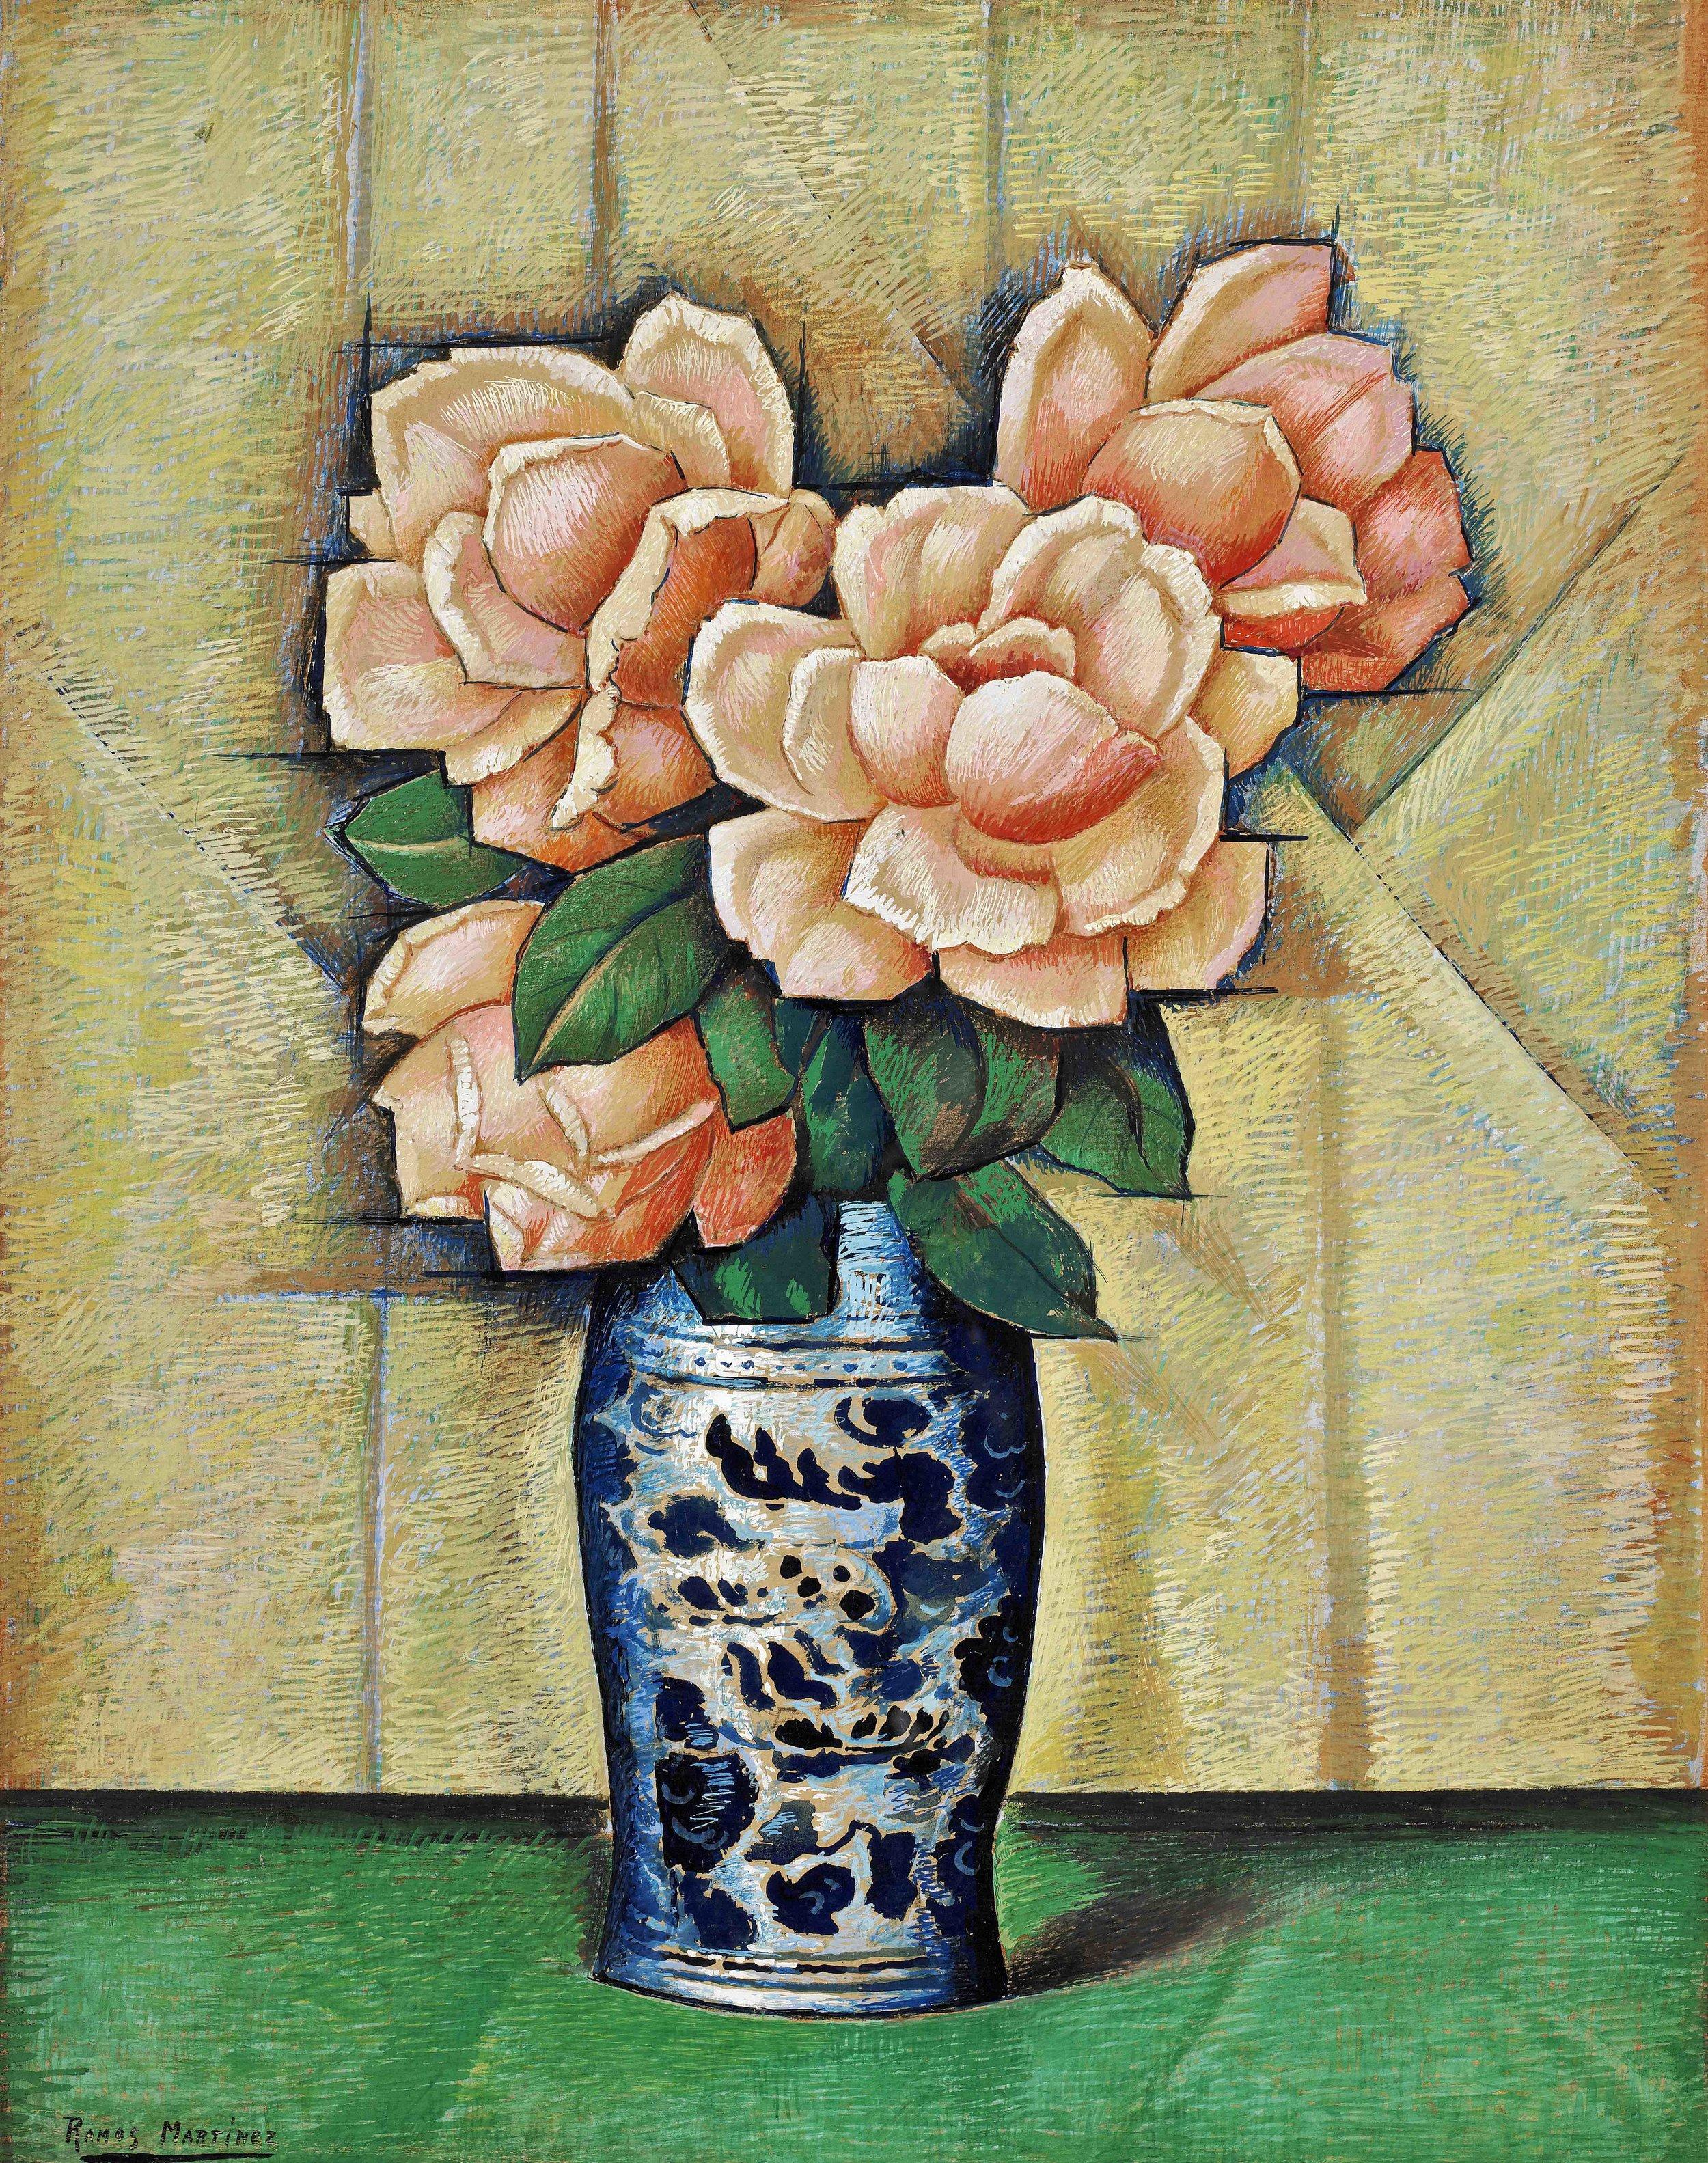 Rosas en Jarrón Azul / Roses in a Blue Vase  ca. 1940 tempera on paper mounted on board / temple sobre papel sobre tabla 24 x 19 inches; 61 x 48.3 centímetros Private collection